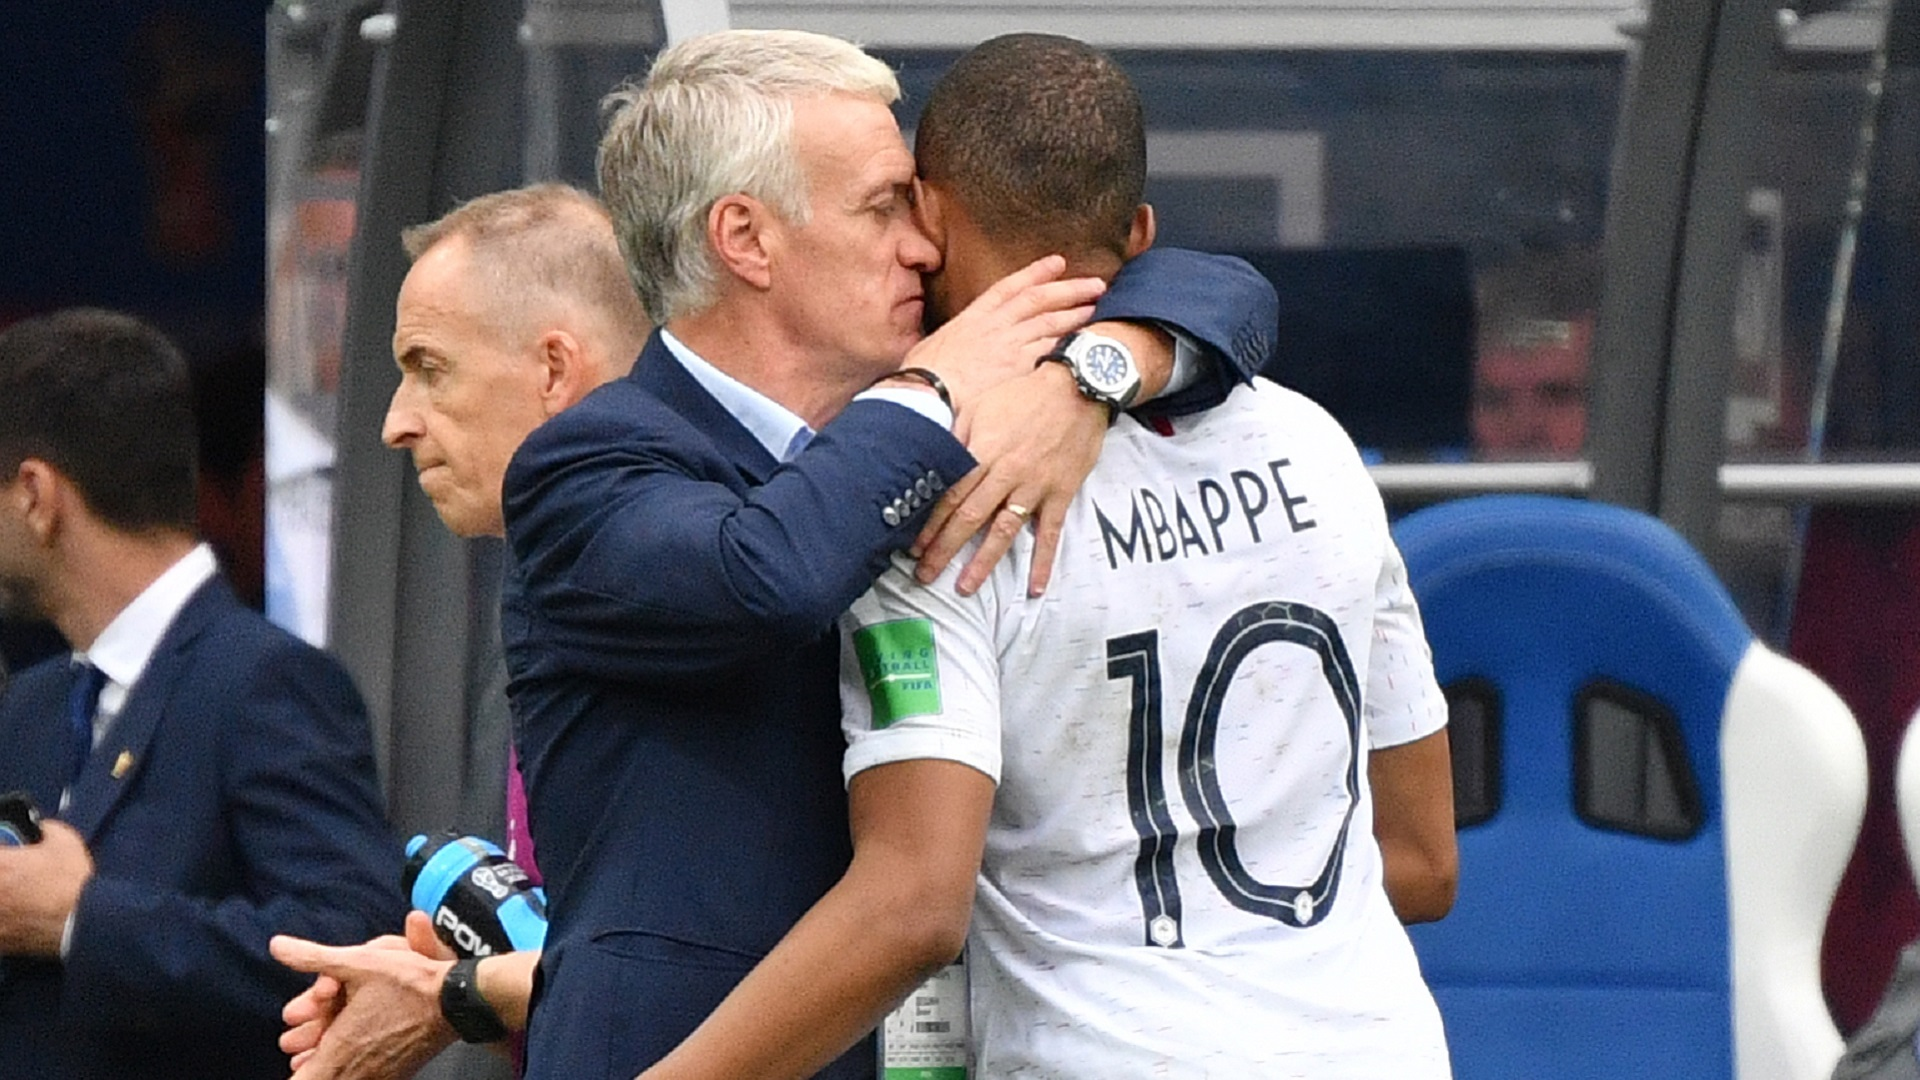 2018-07-10 Mbappe France